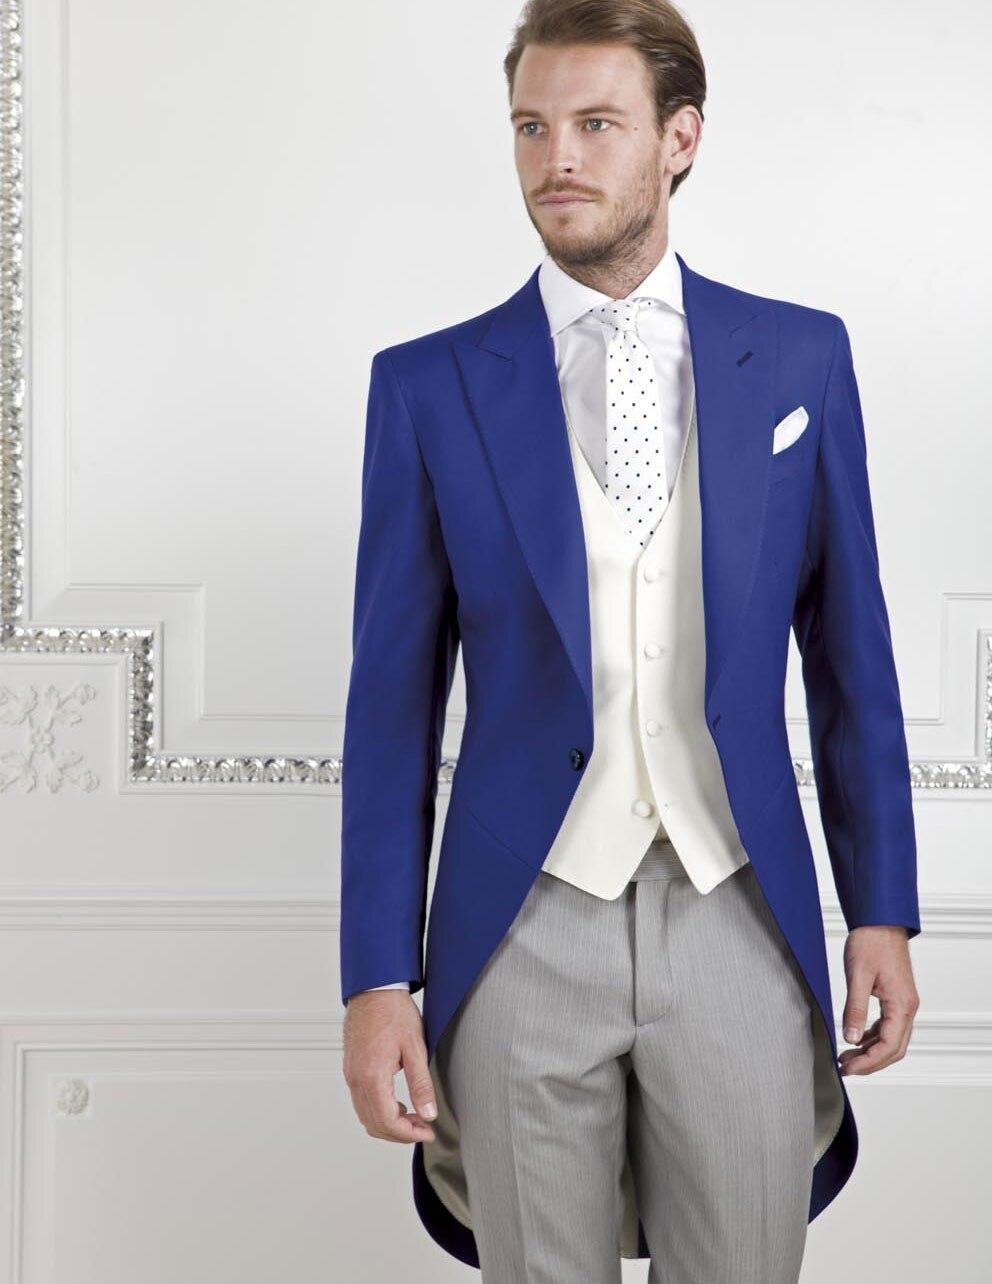 3e098d321a0 Custom italian western style navy Blue Groom Tuxedos Groomsmen dress Men s  Wedding Suits Best man Suits (Jacket+Pants+Vest+Tie)